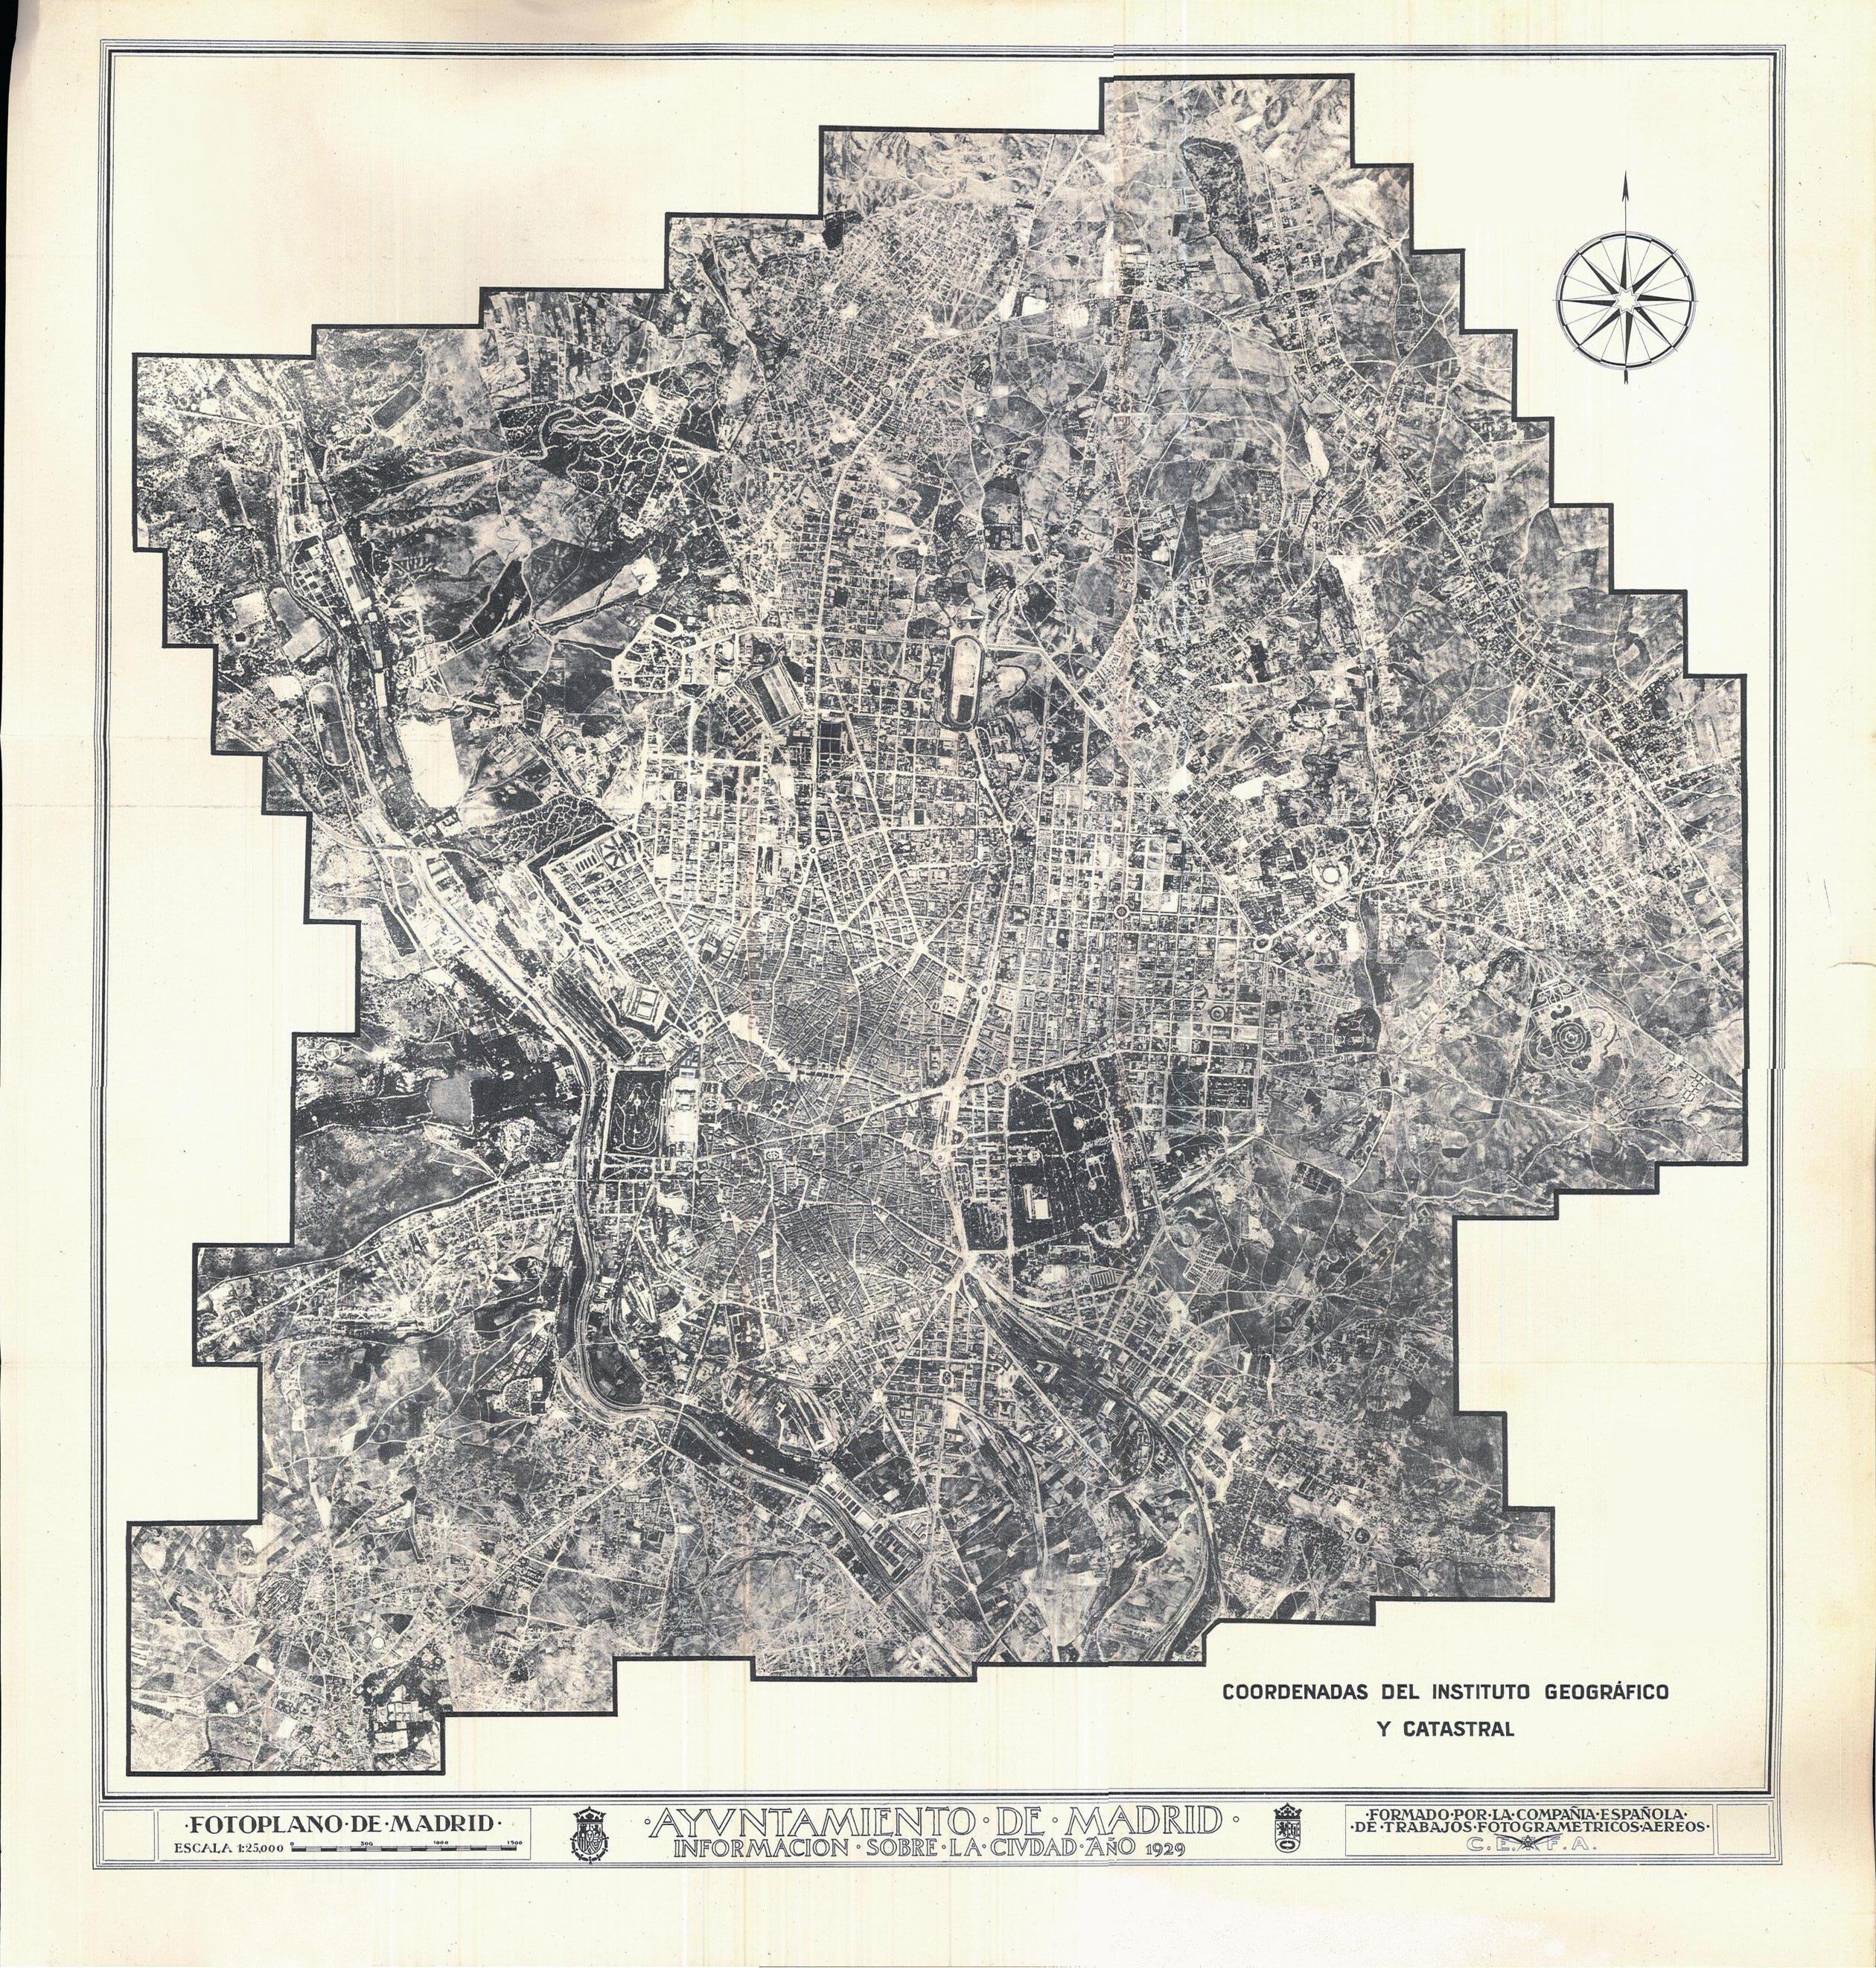 Photomap of Madrid 1929